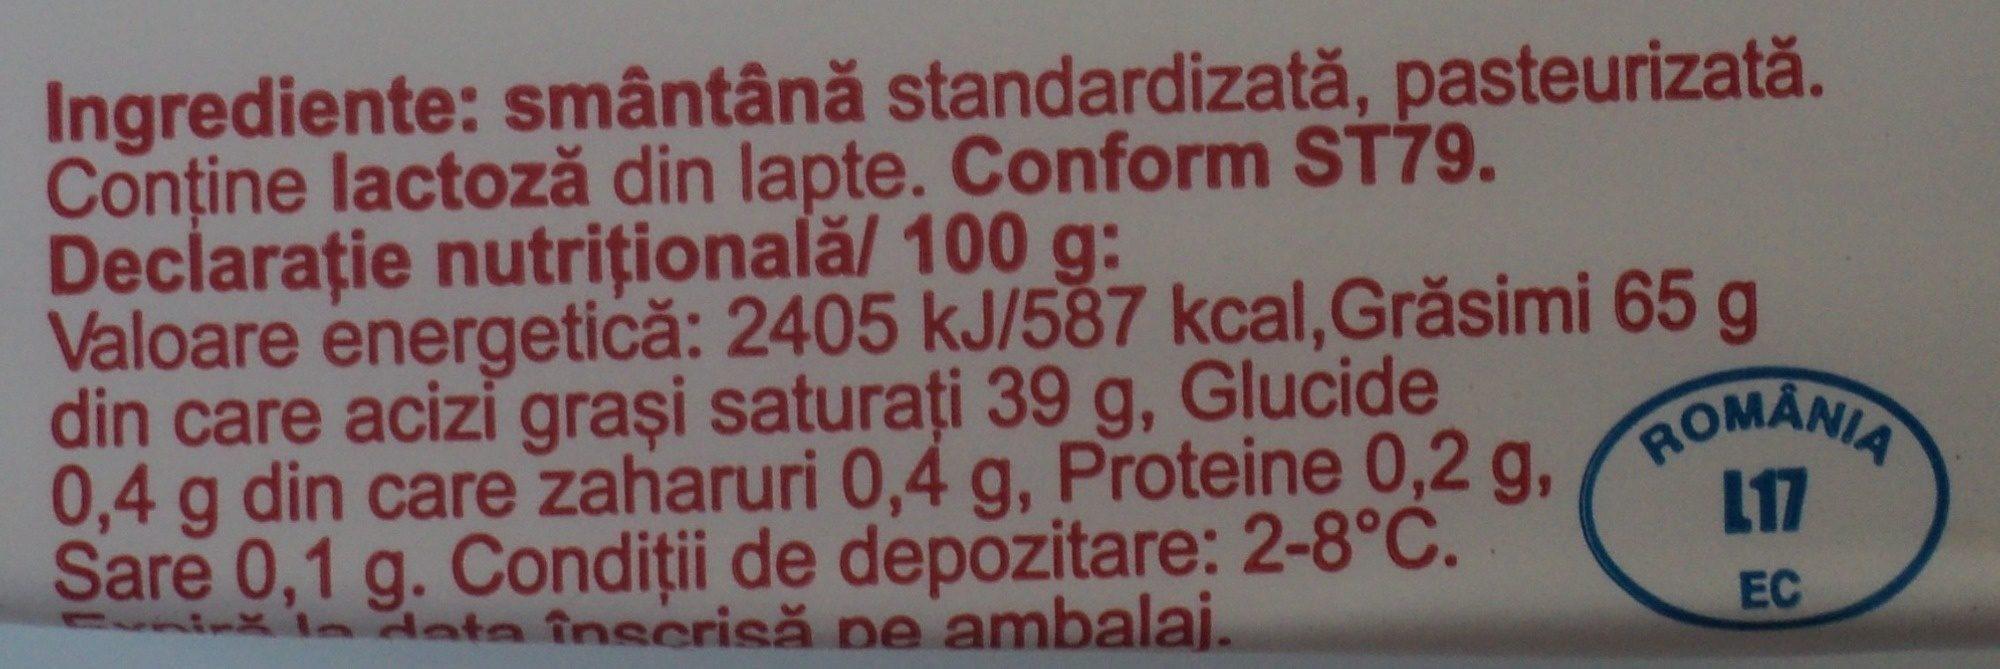 Albalact Unt de masa tip B 200g - Nutrition facts - ro